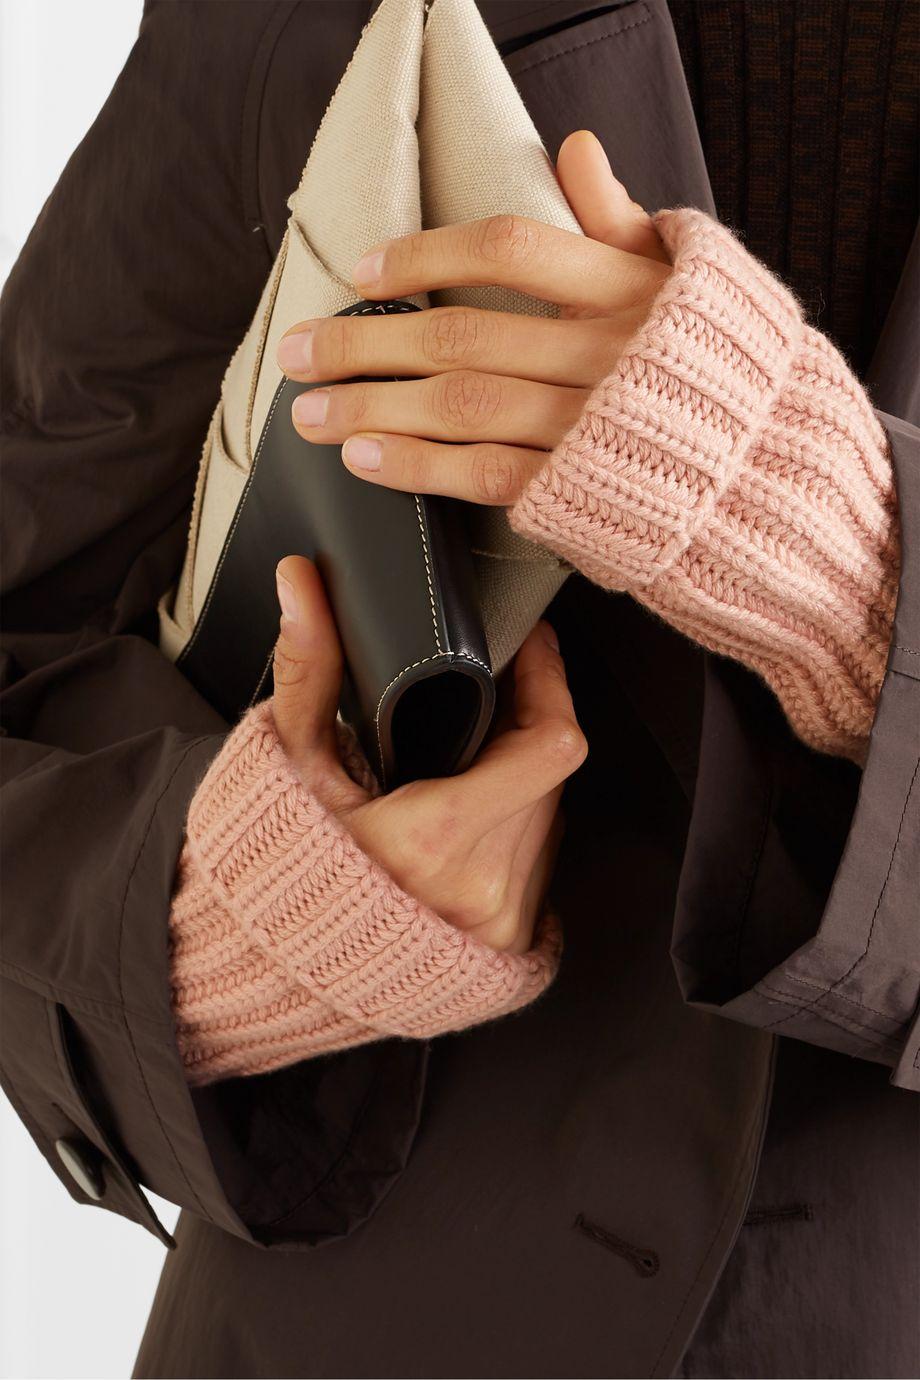 Loro Piana Ribbed cashmere wrist warmers